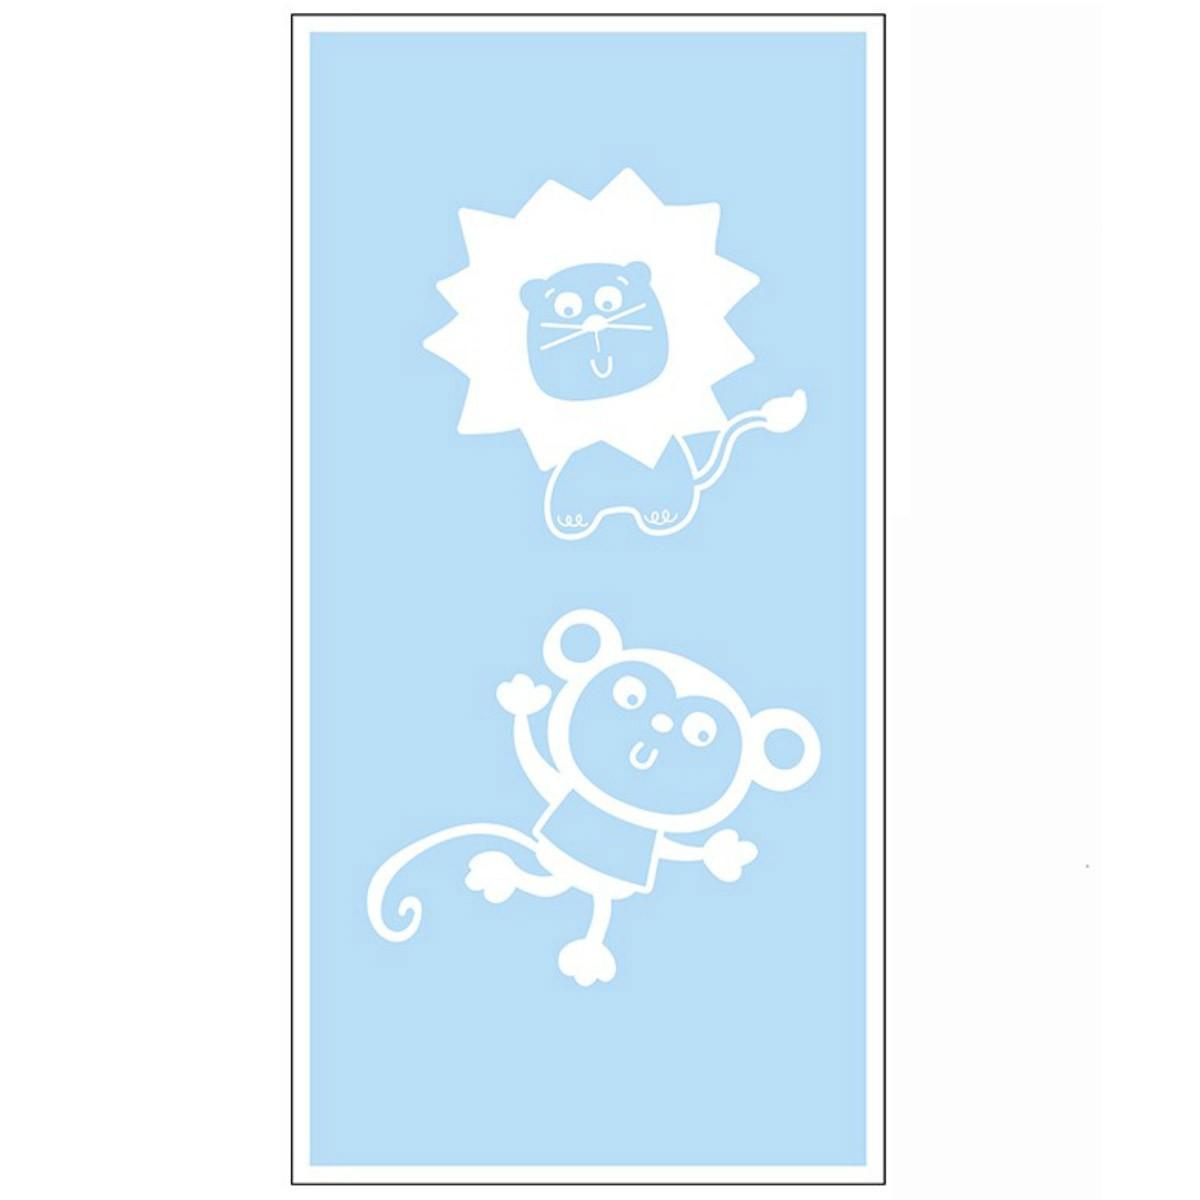 26cfe49ca94 Spiti Shop Παιδική Πετσέτα Θαλάσσης Kentia Leone